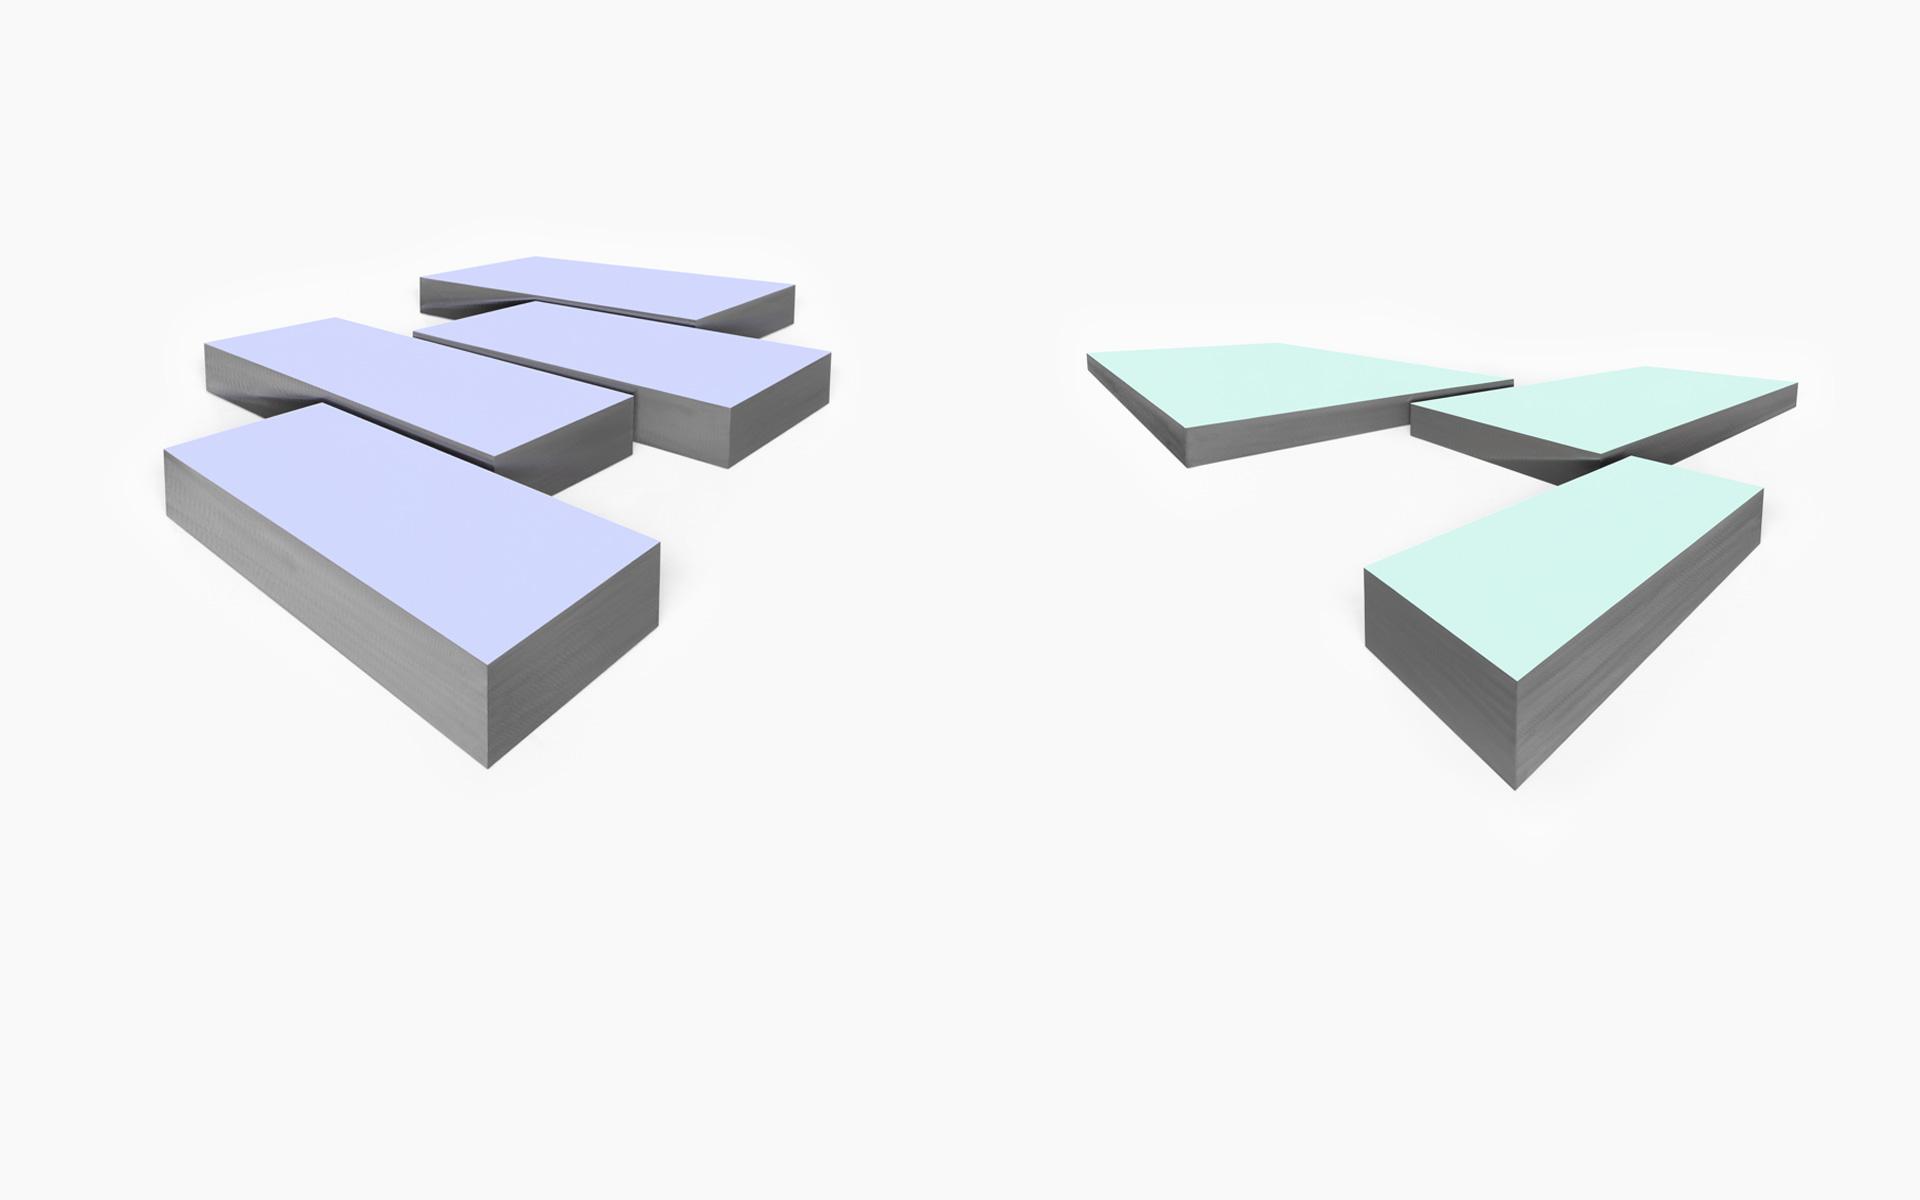 left: RUN, four parts, 2017 Acrylic on steel 72.5 × 95 × 7.5 cm / right: MIS, three parts, 2018 Acrylic on steel 70.2 × 110.7 × 10.7 cm - Photos: Christoph Valentien